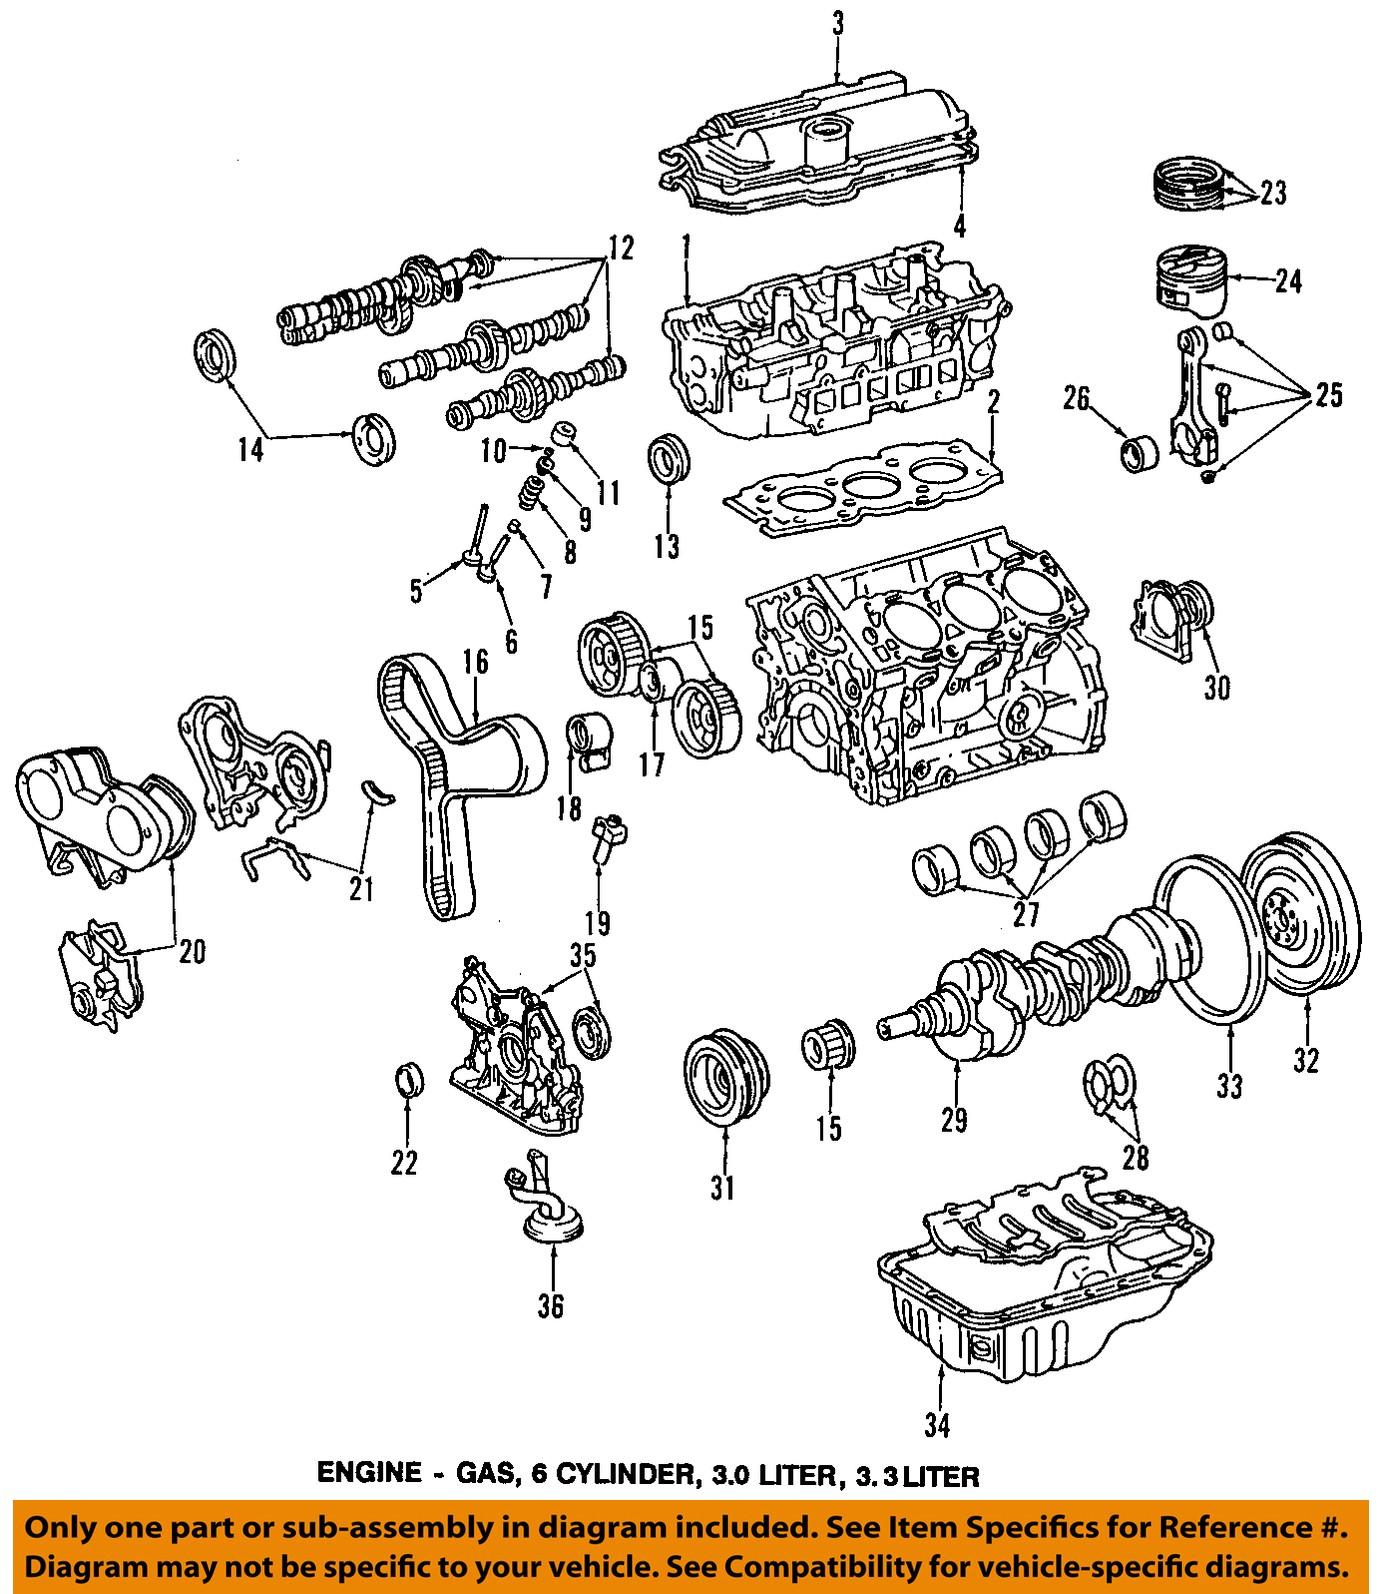 1997 toyota Camry Engine Diagram toyota Oem Valve Lifter Of 1997 toyota Camry Engine Diagram